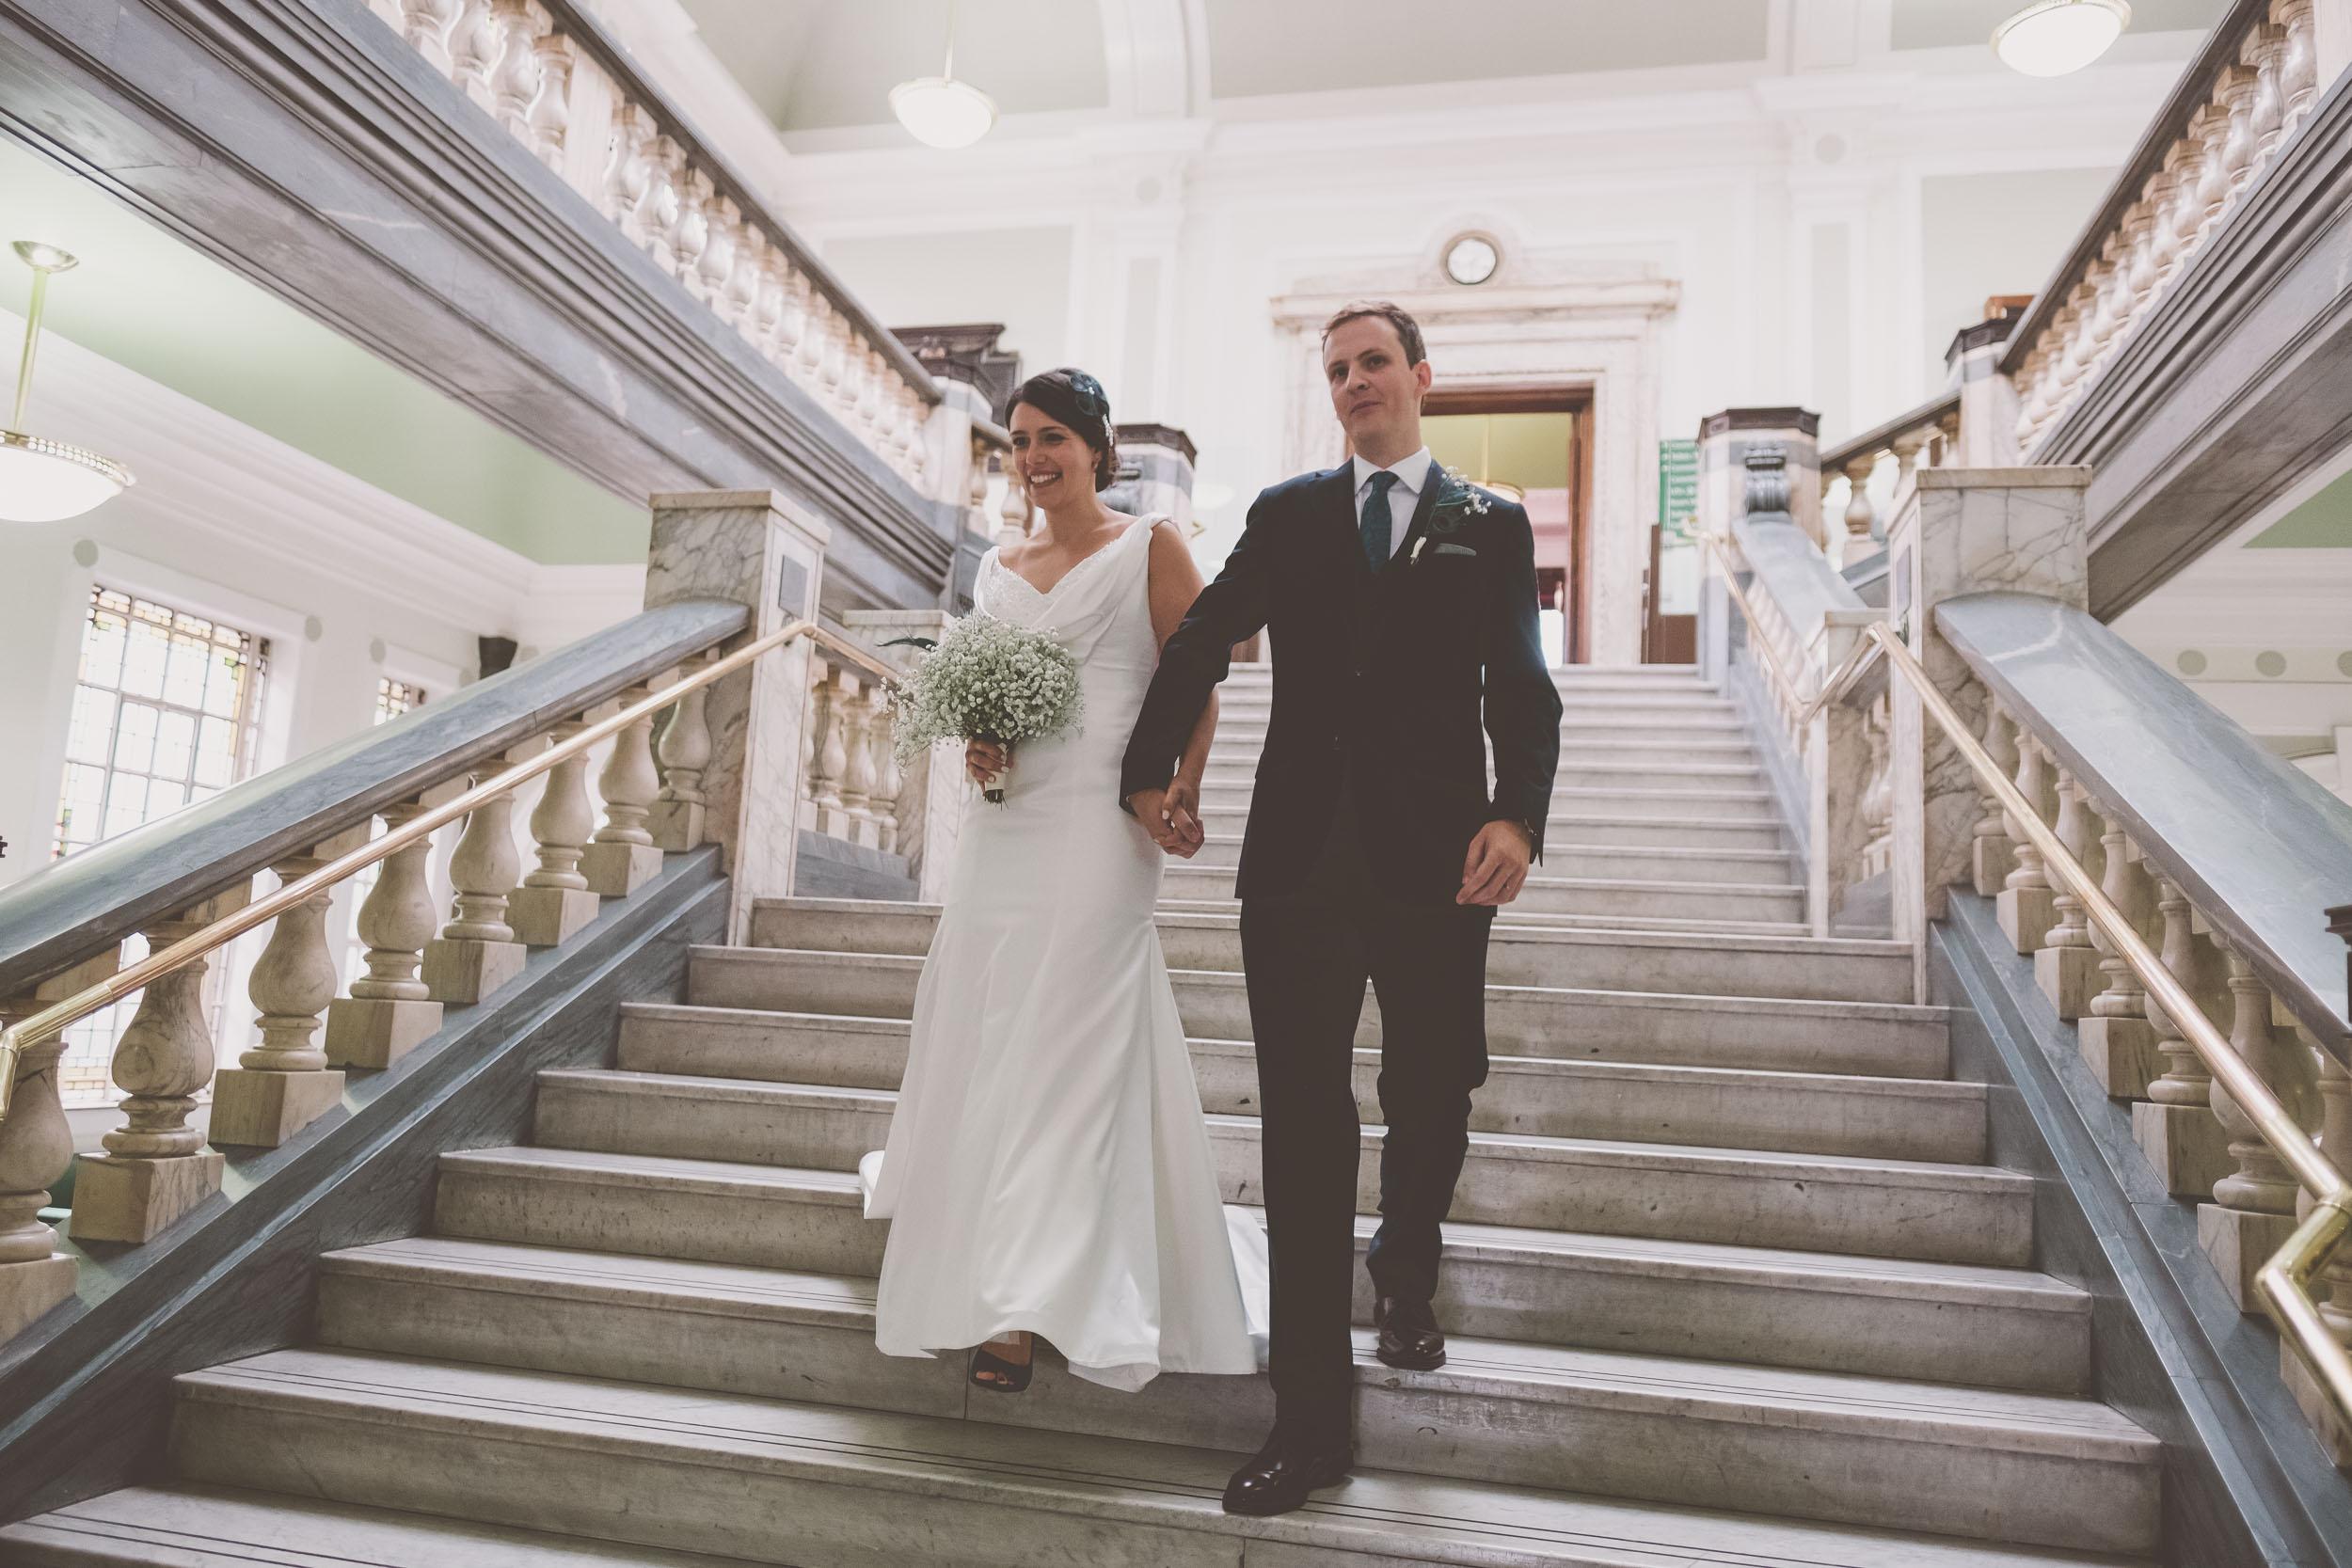 islington-town-hall-4th-floor-studios-wedding142.jpg